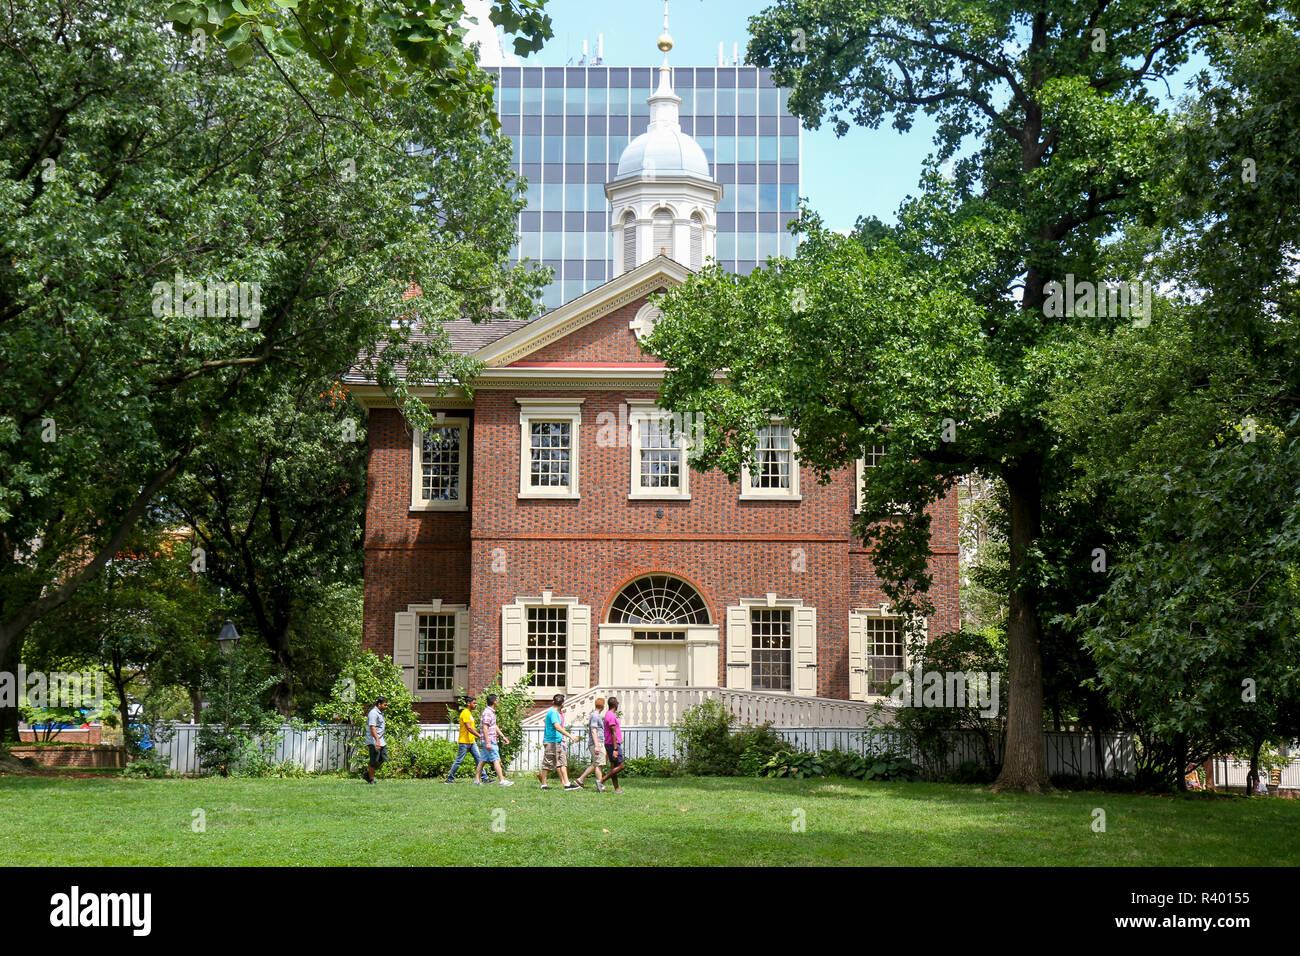 Carpenters' Hall, Independence National Historical Park, Philadelphia, Pennsylvania, Usa. Stock Photo